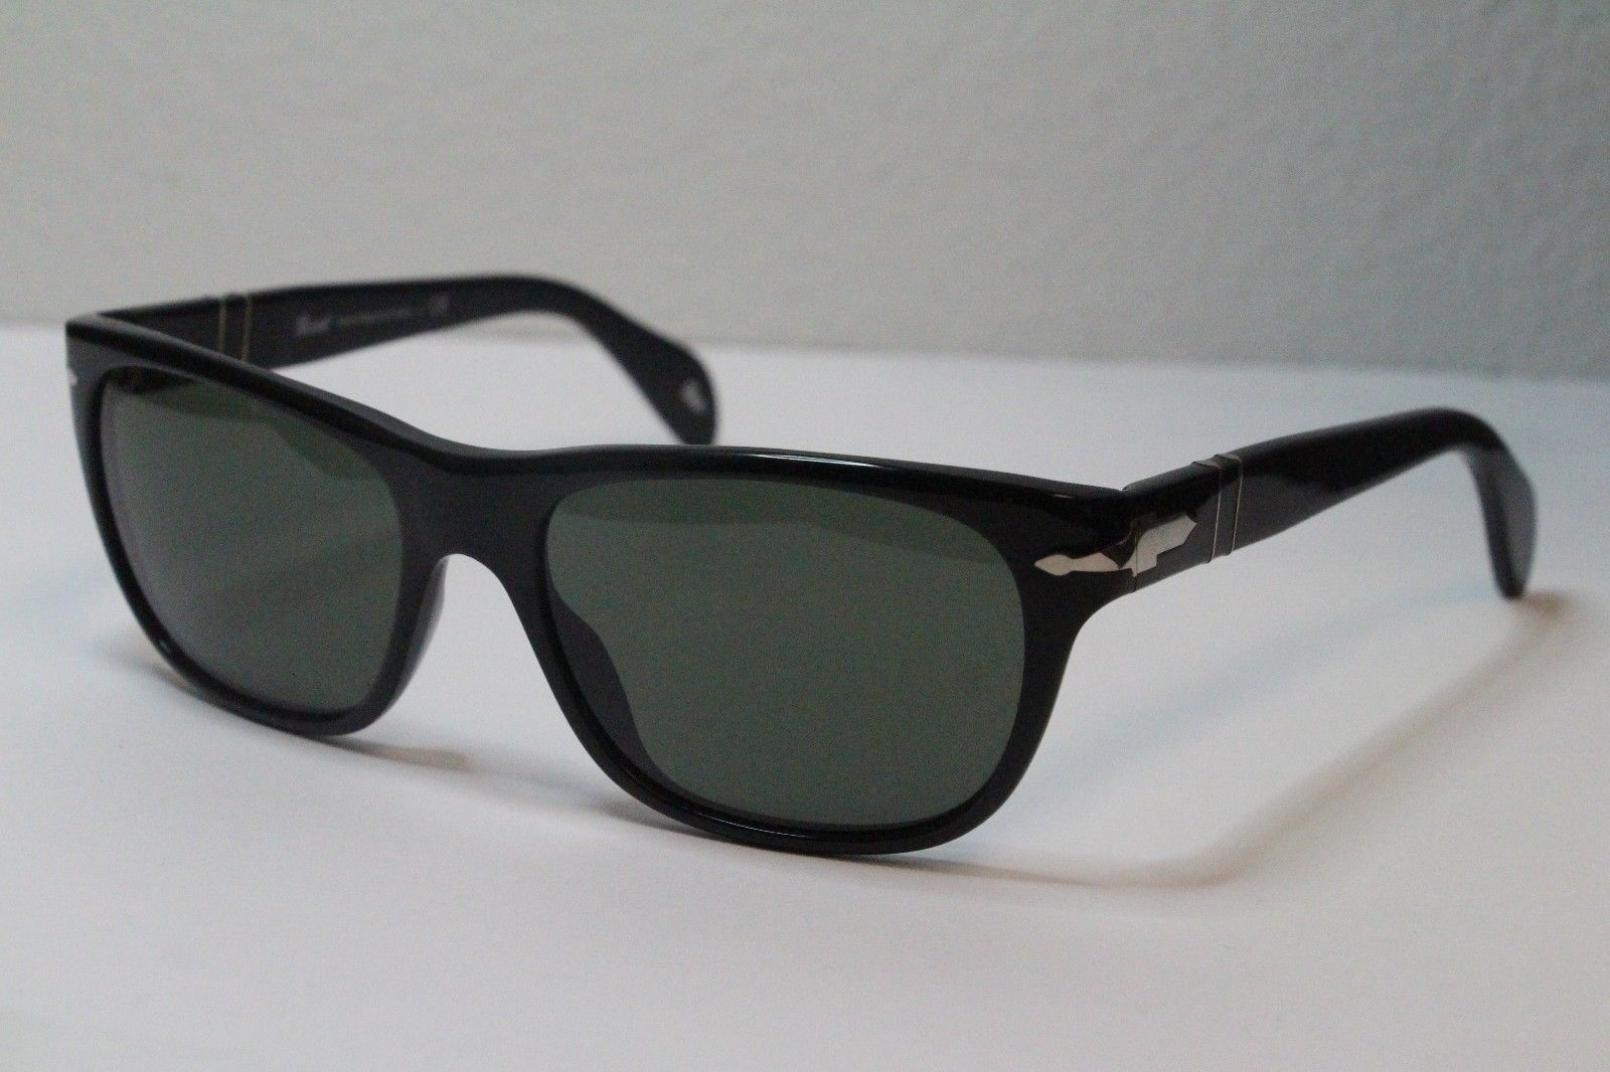 2ff281572b Persol 2944 Sunglasses